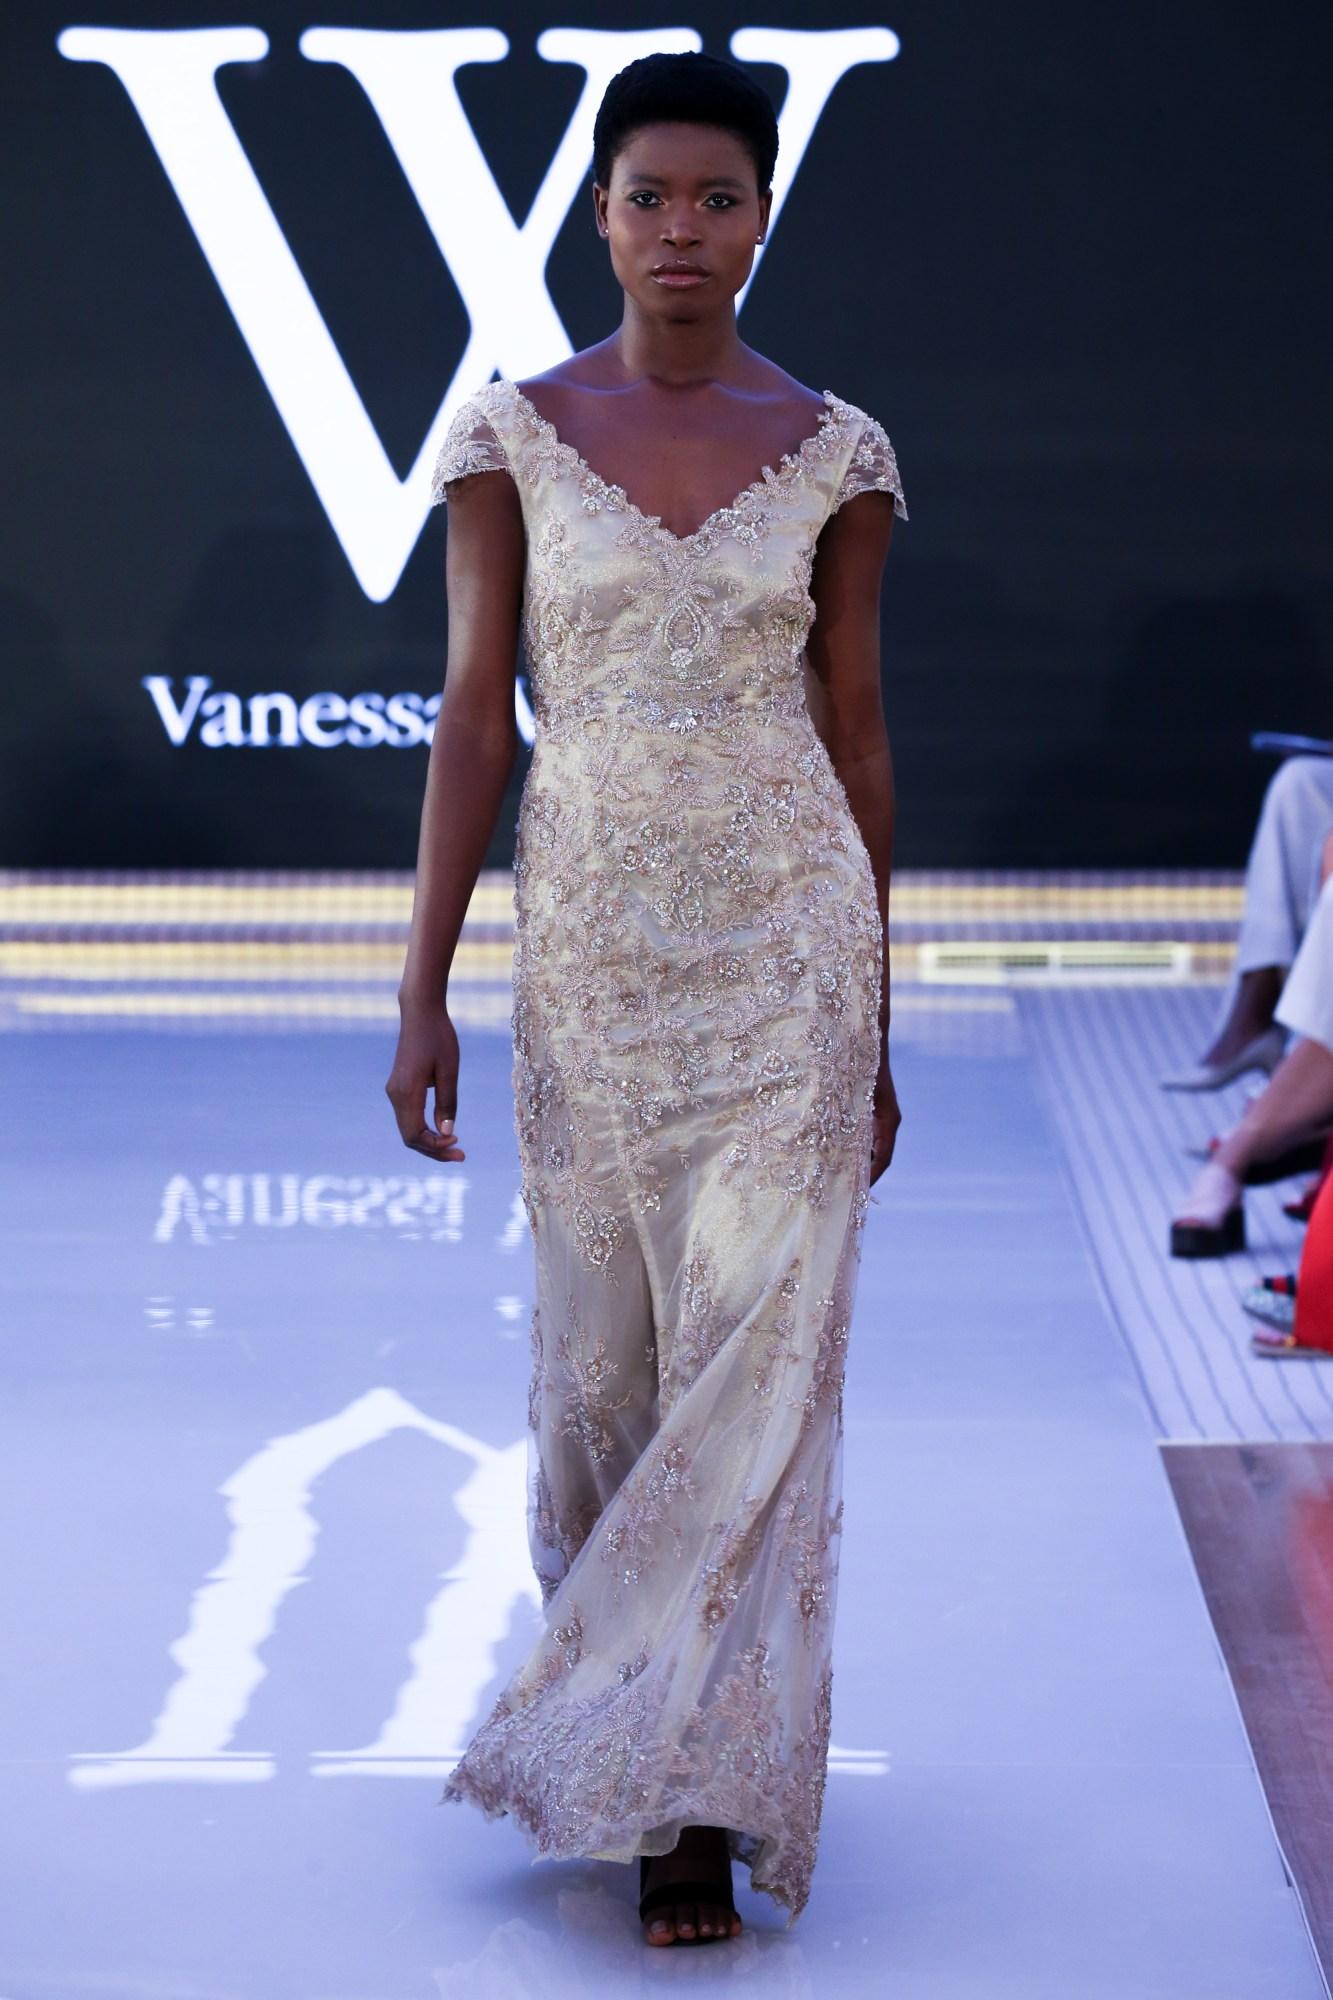 Vanessa VillafaneReady Couture Fall Winter 2018 CollectionDubai Fashion Week